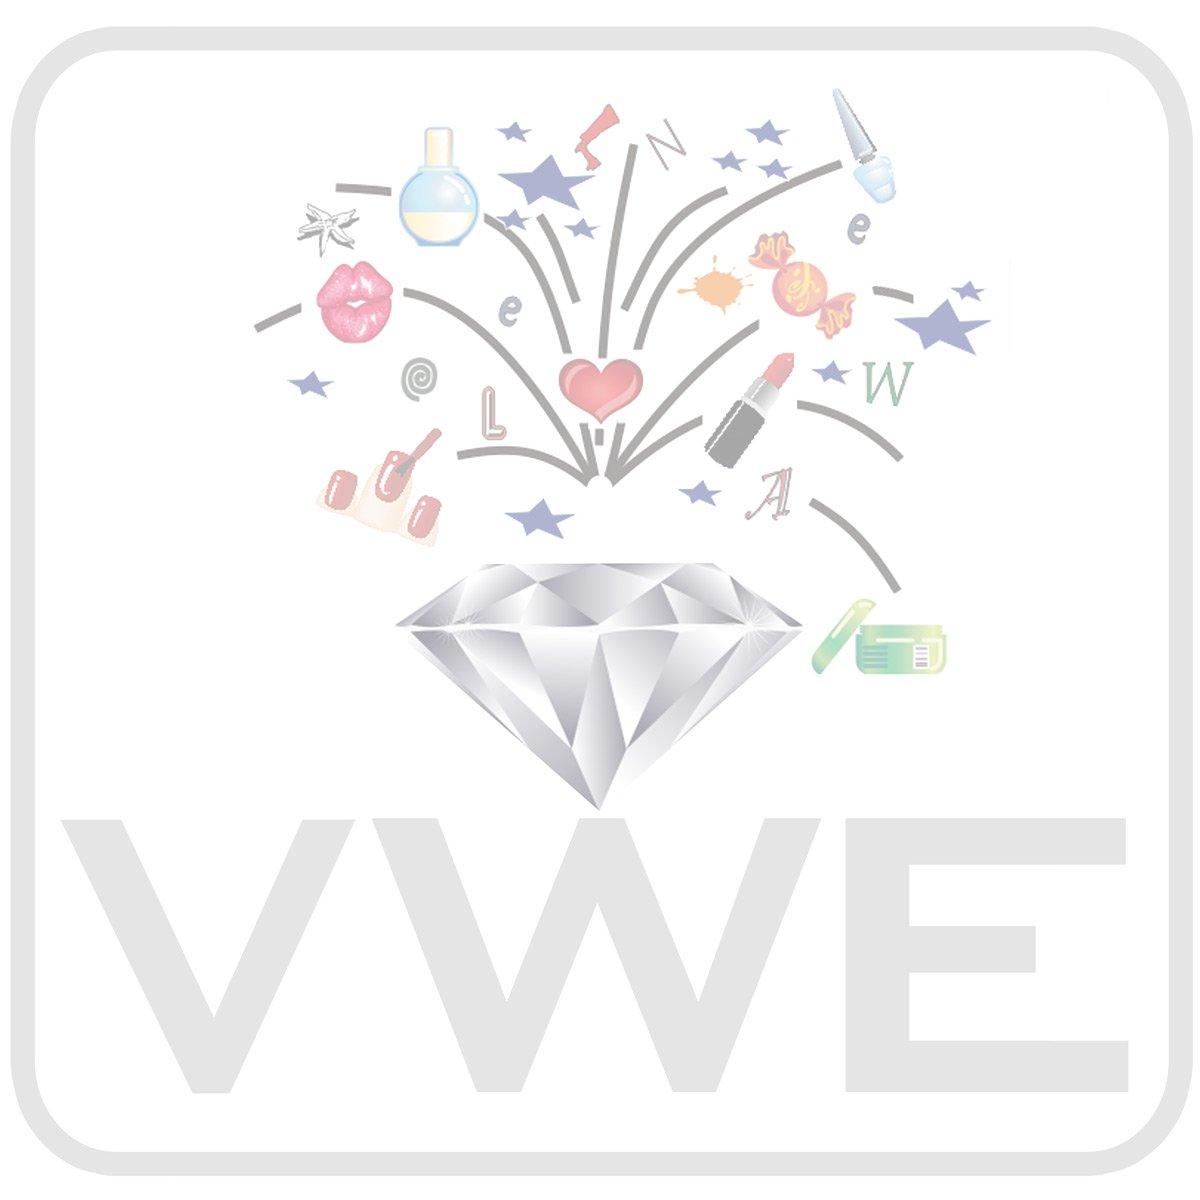 UV Gel Flux Diamond Touch Colour Pop Art - 5ml  [11 / 12]